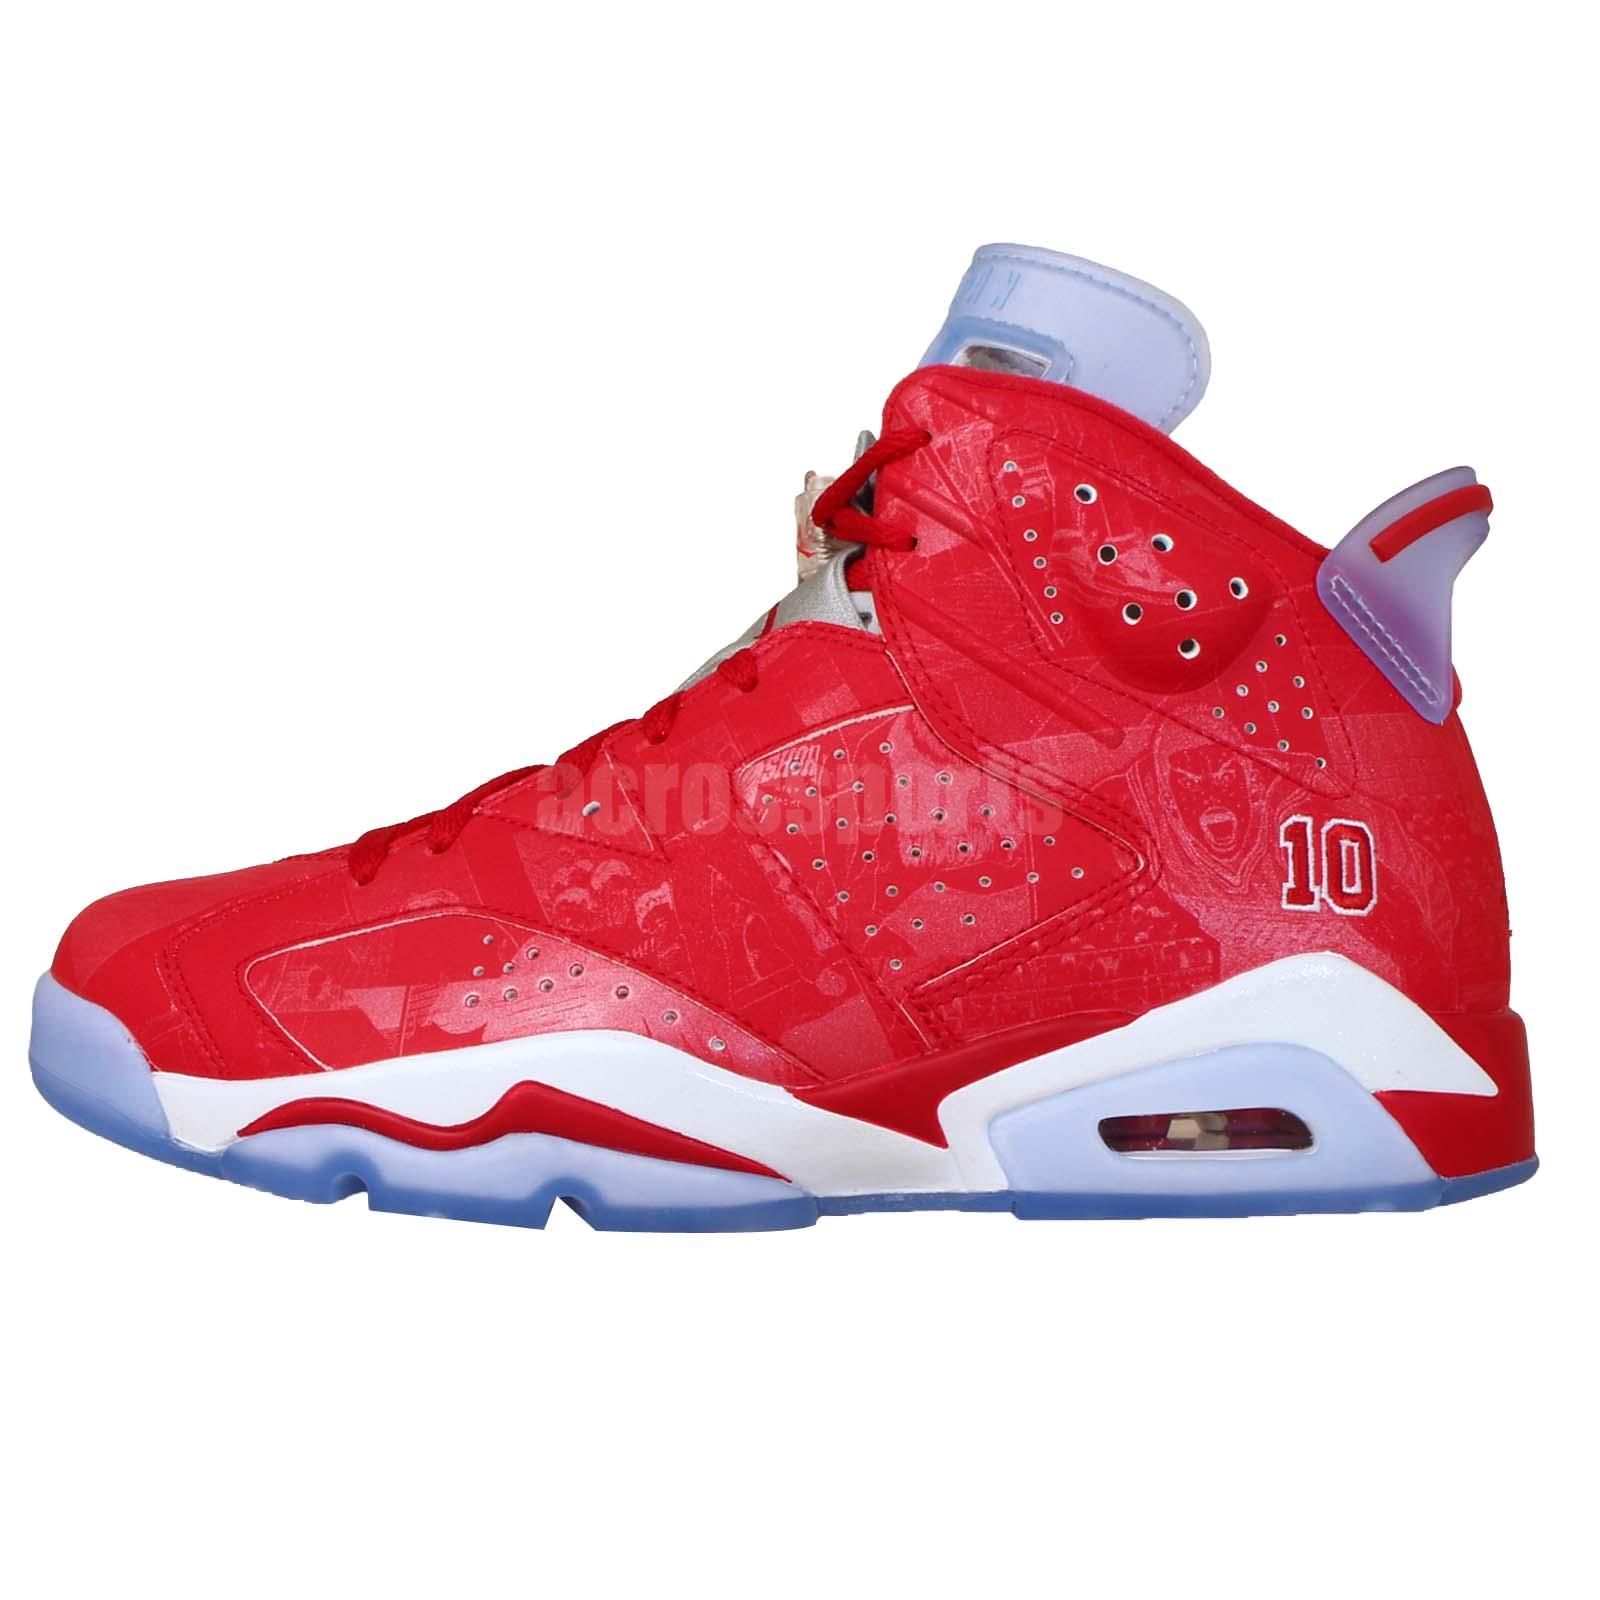 Nike Air Jordan 6 Retro X Slam Dunk VI Red Reflective Mens